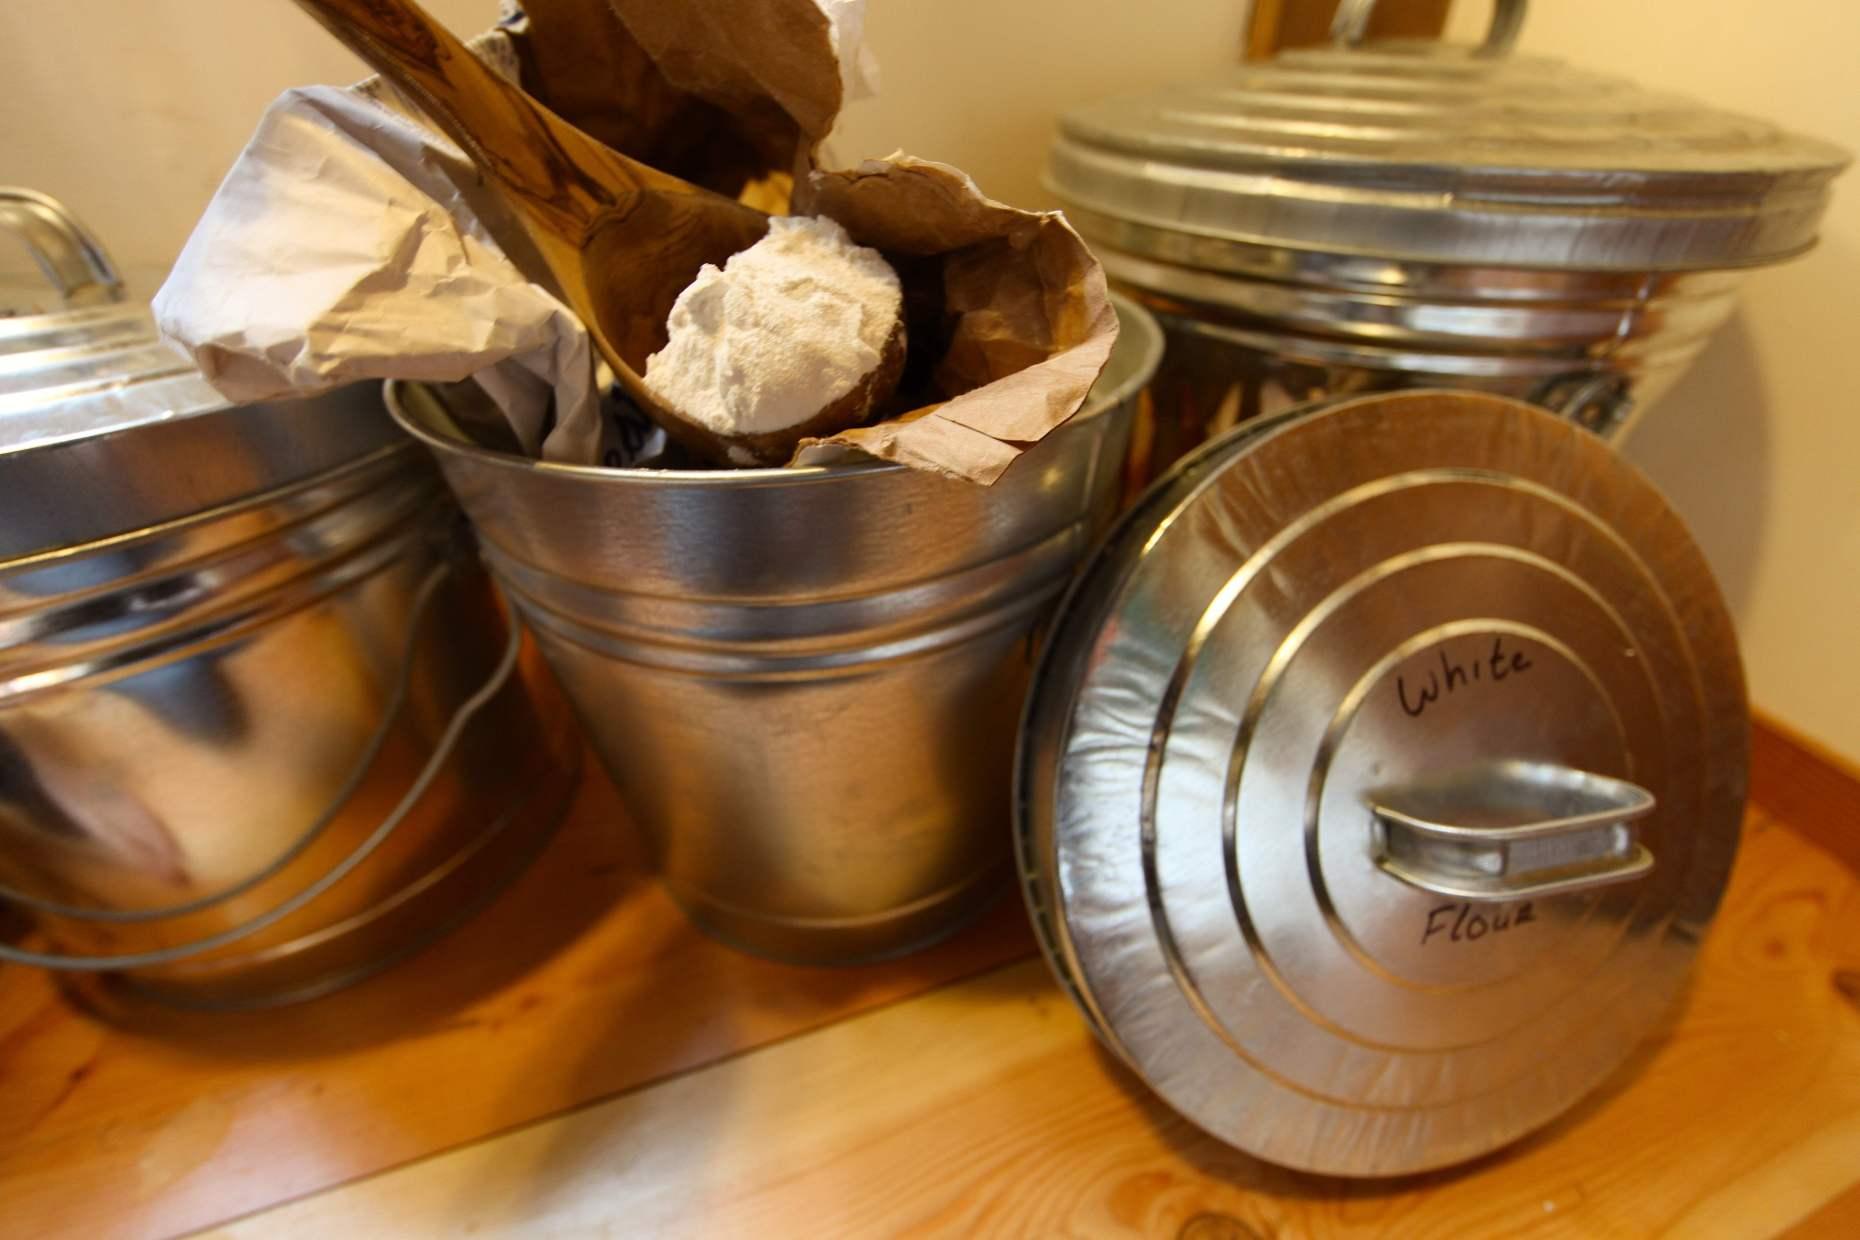 Flour Procured From the Organic White Flour Bin. Photo © Liesl Clark